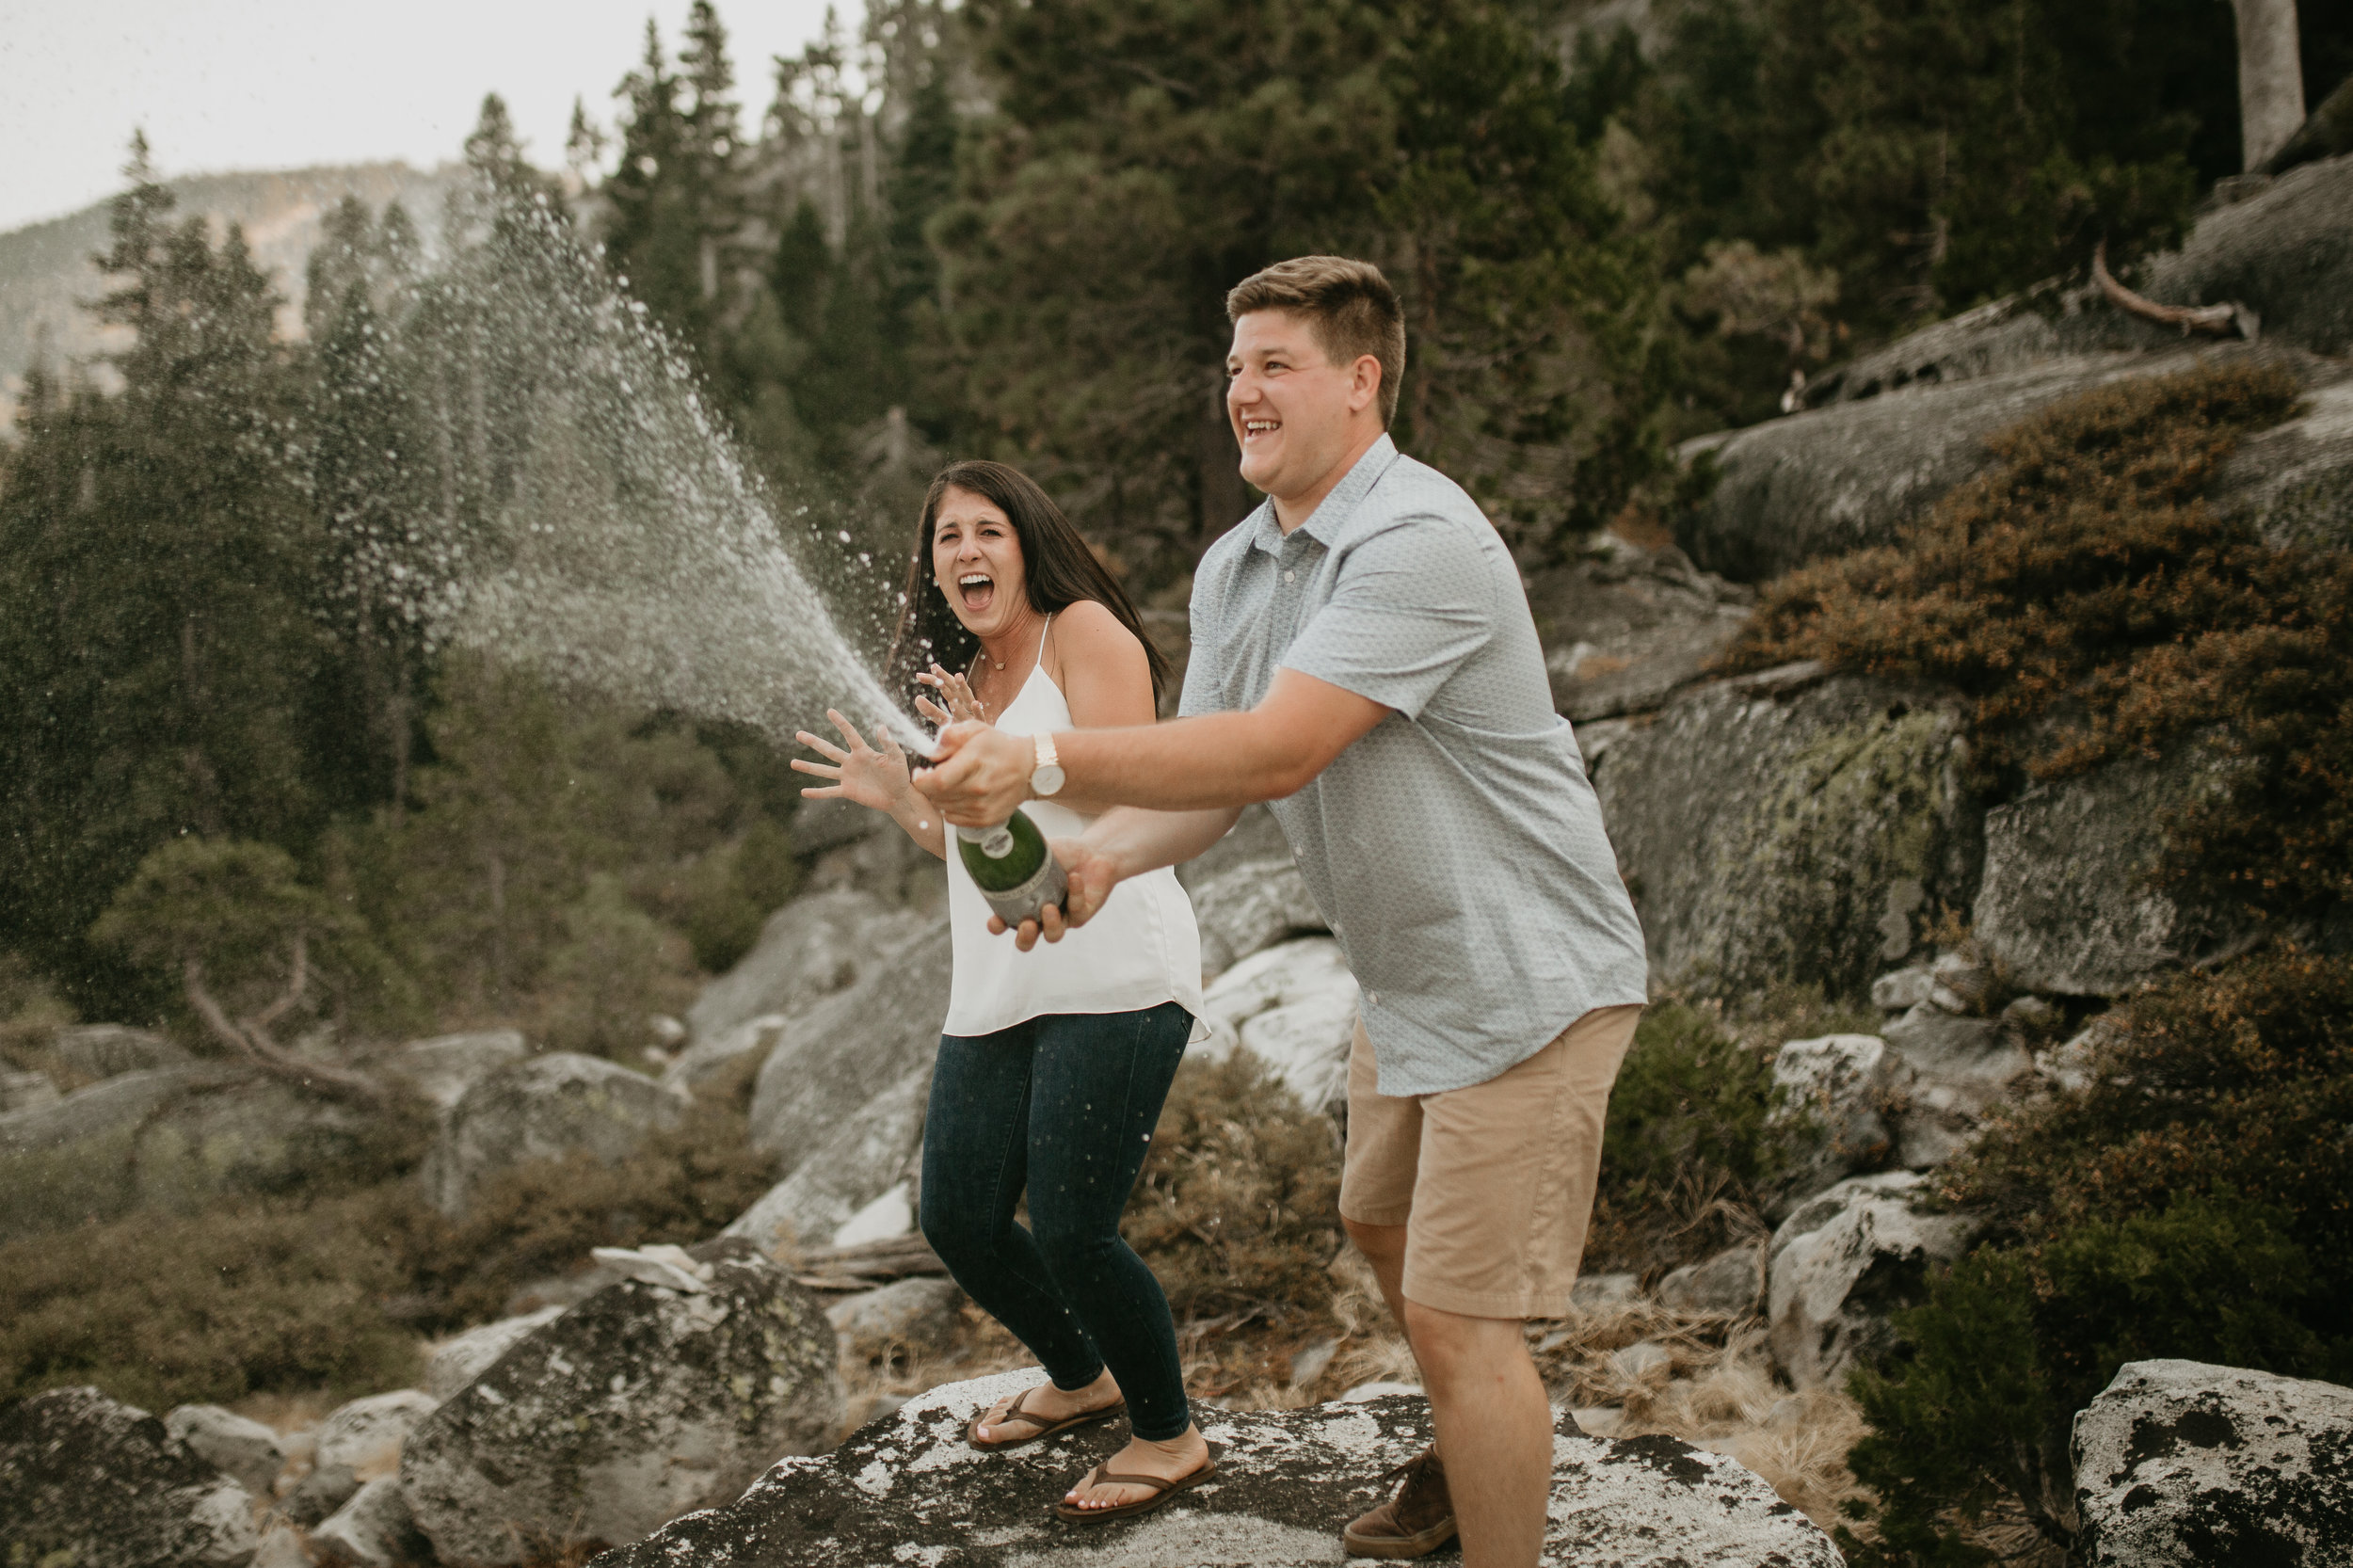 nicole-daacke-photography-fun-adventure-session-waterfall-lake-tahoe-sunset-destination-wedding-photographer-northern-california-elopement-photographer-21.jpg